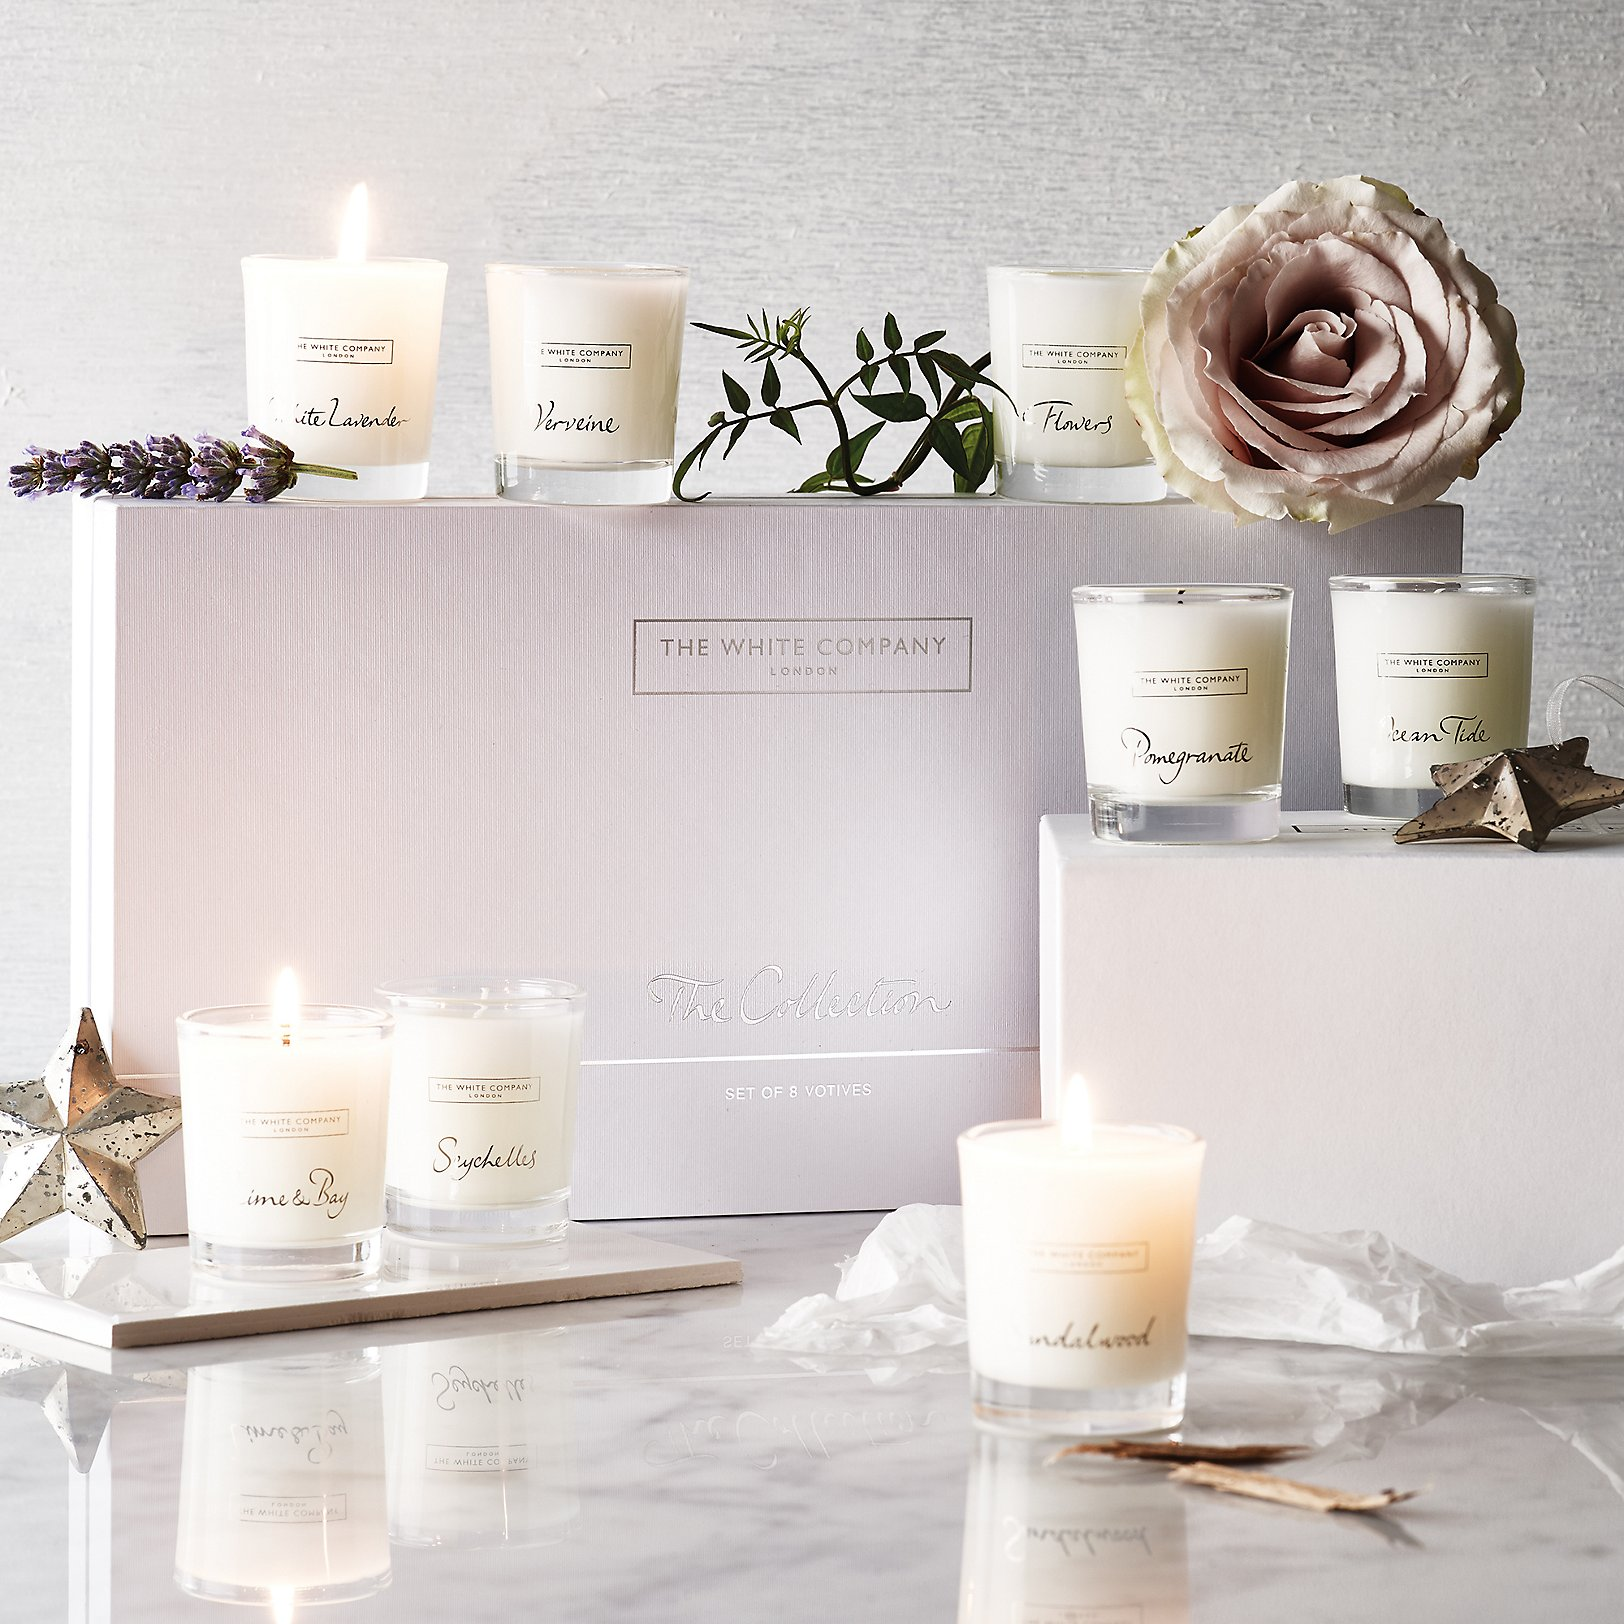 Interior design home fragrance gift set - Votive Candle Collection Set Of 8